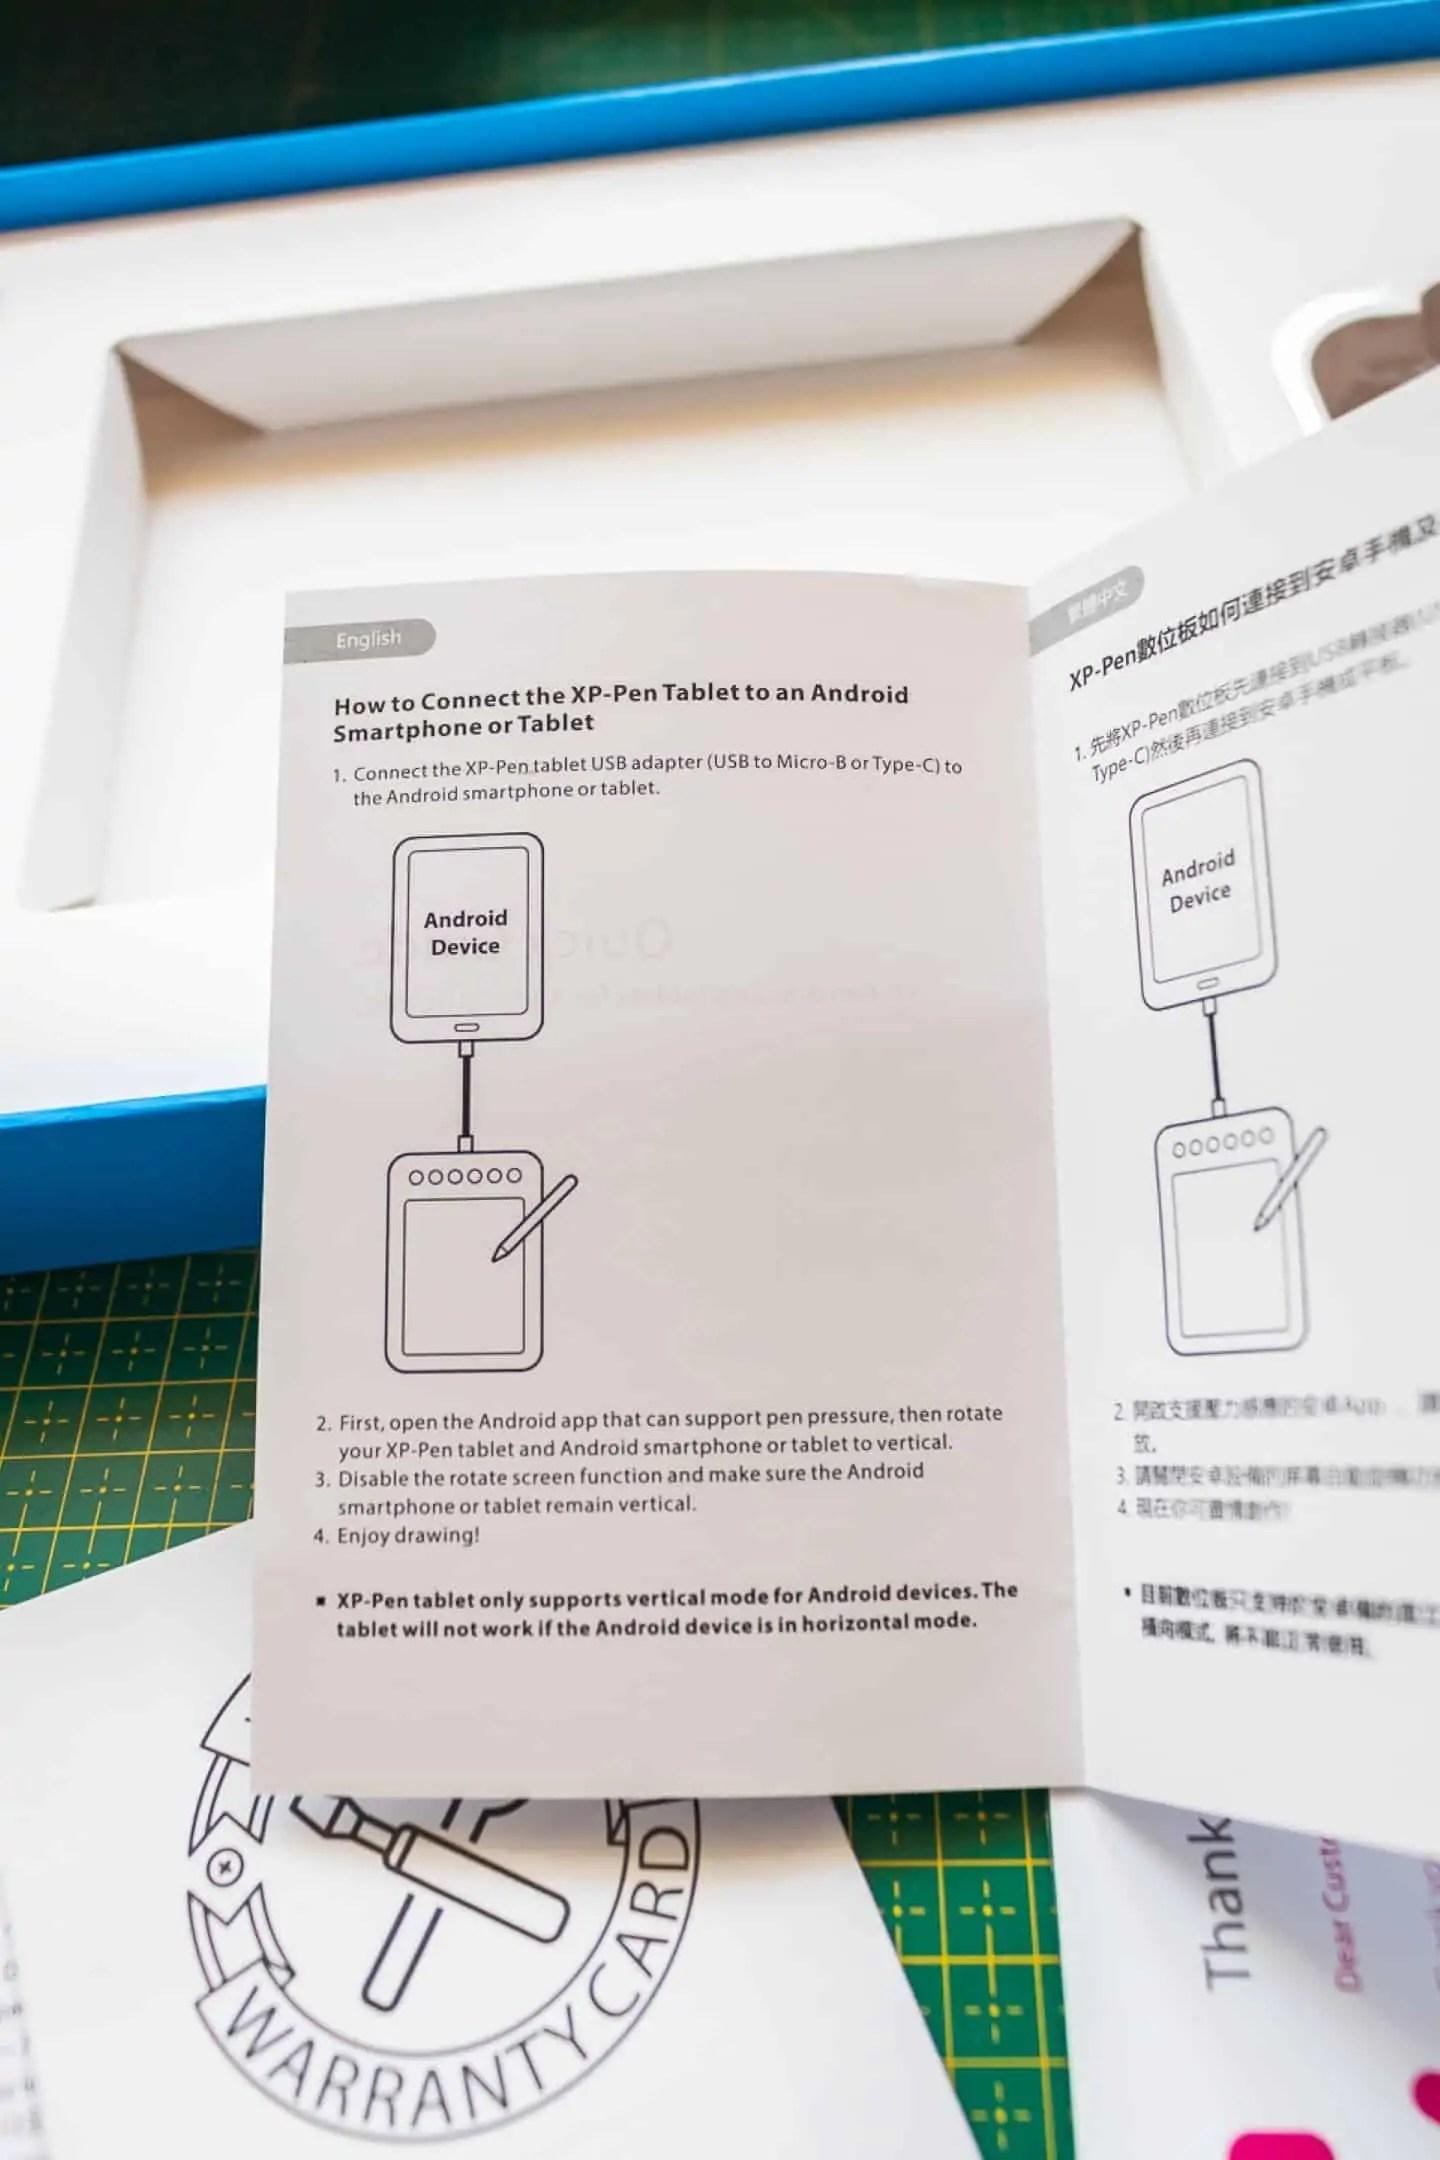 Podlaczanie tabletu do komputera albo tabletu android albo apple iOS - Praca z tabletem graficznym XP PEN Deco 01 v2